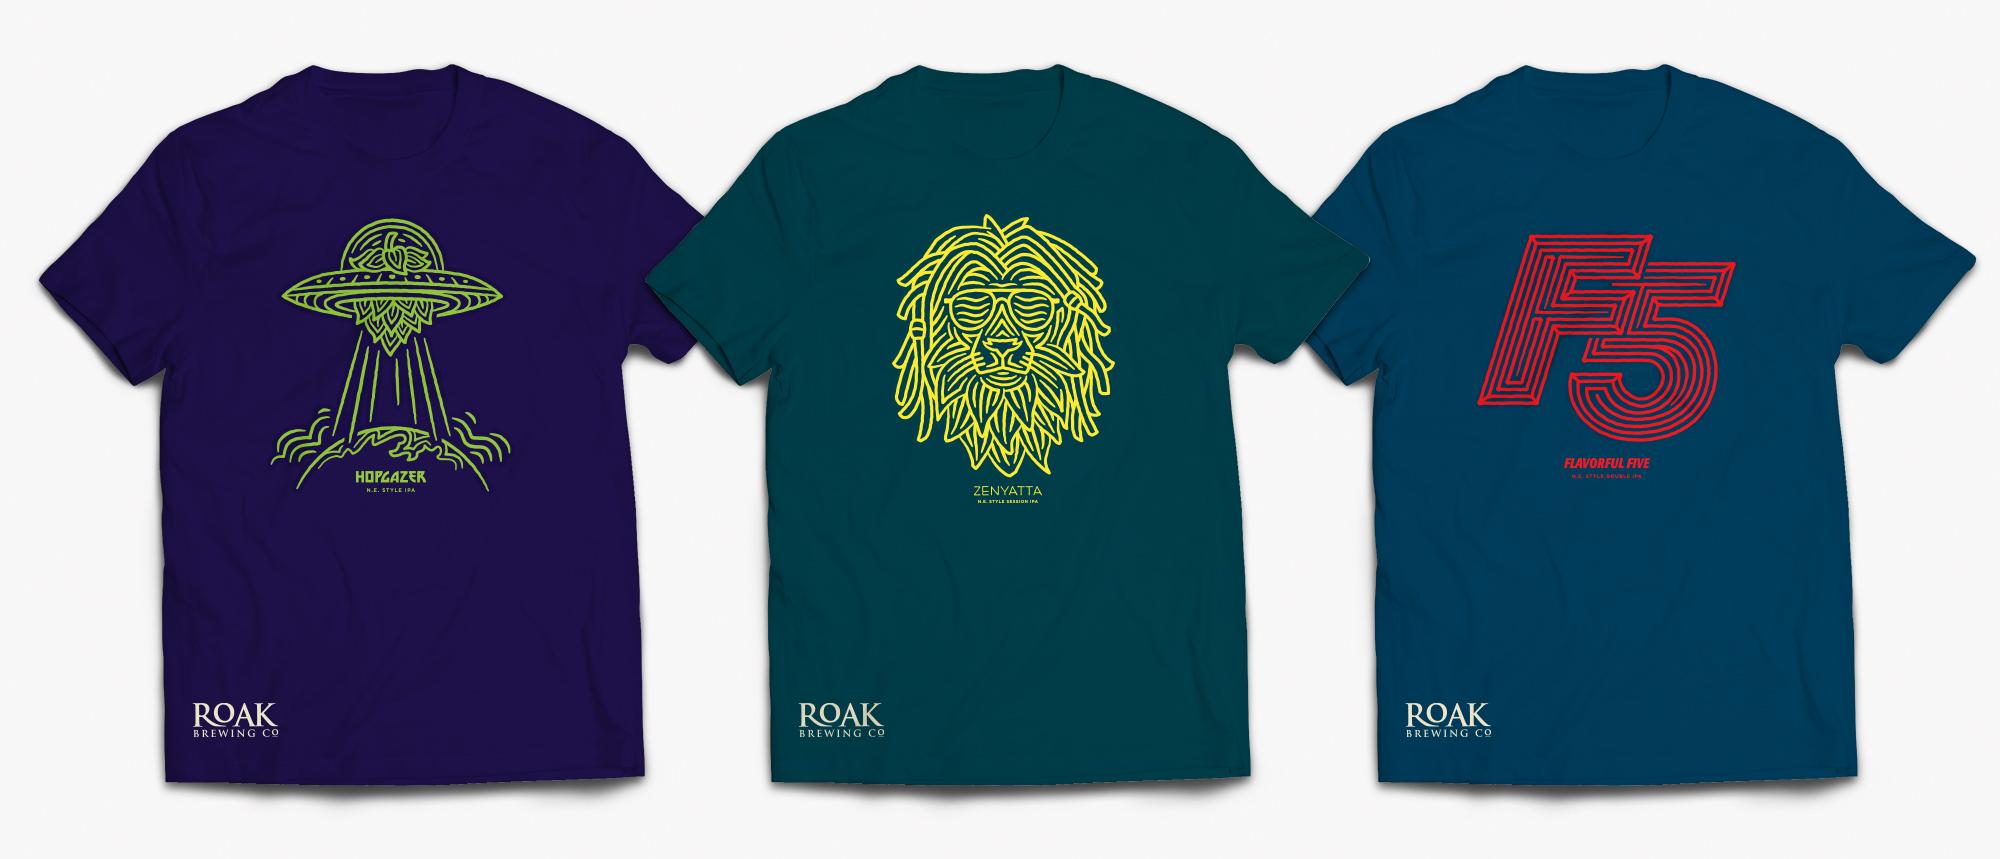 Custom Apparel Designs for craft brewery, Roak Brewing Co.